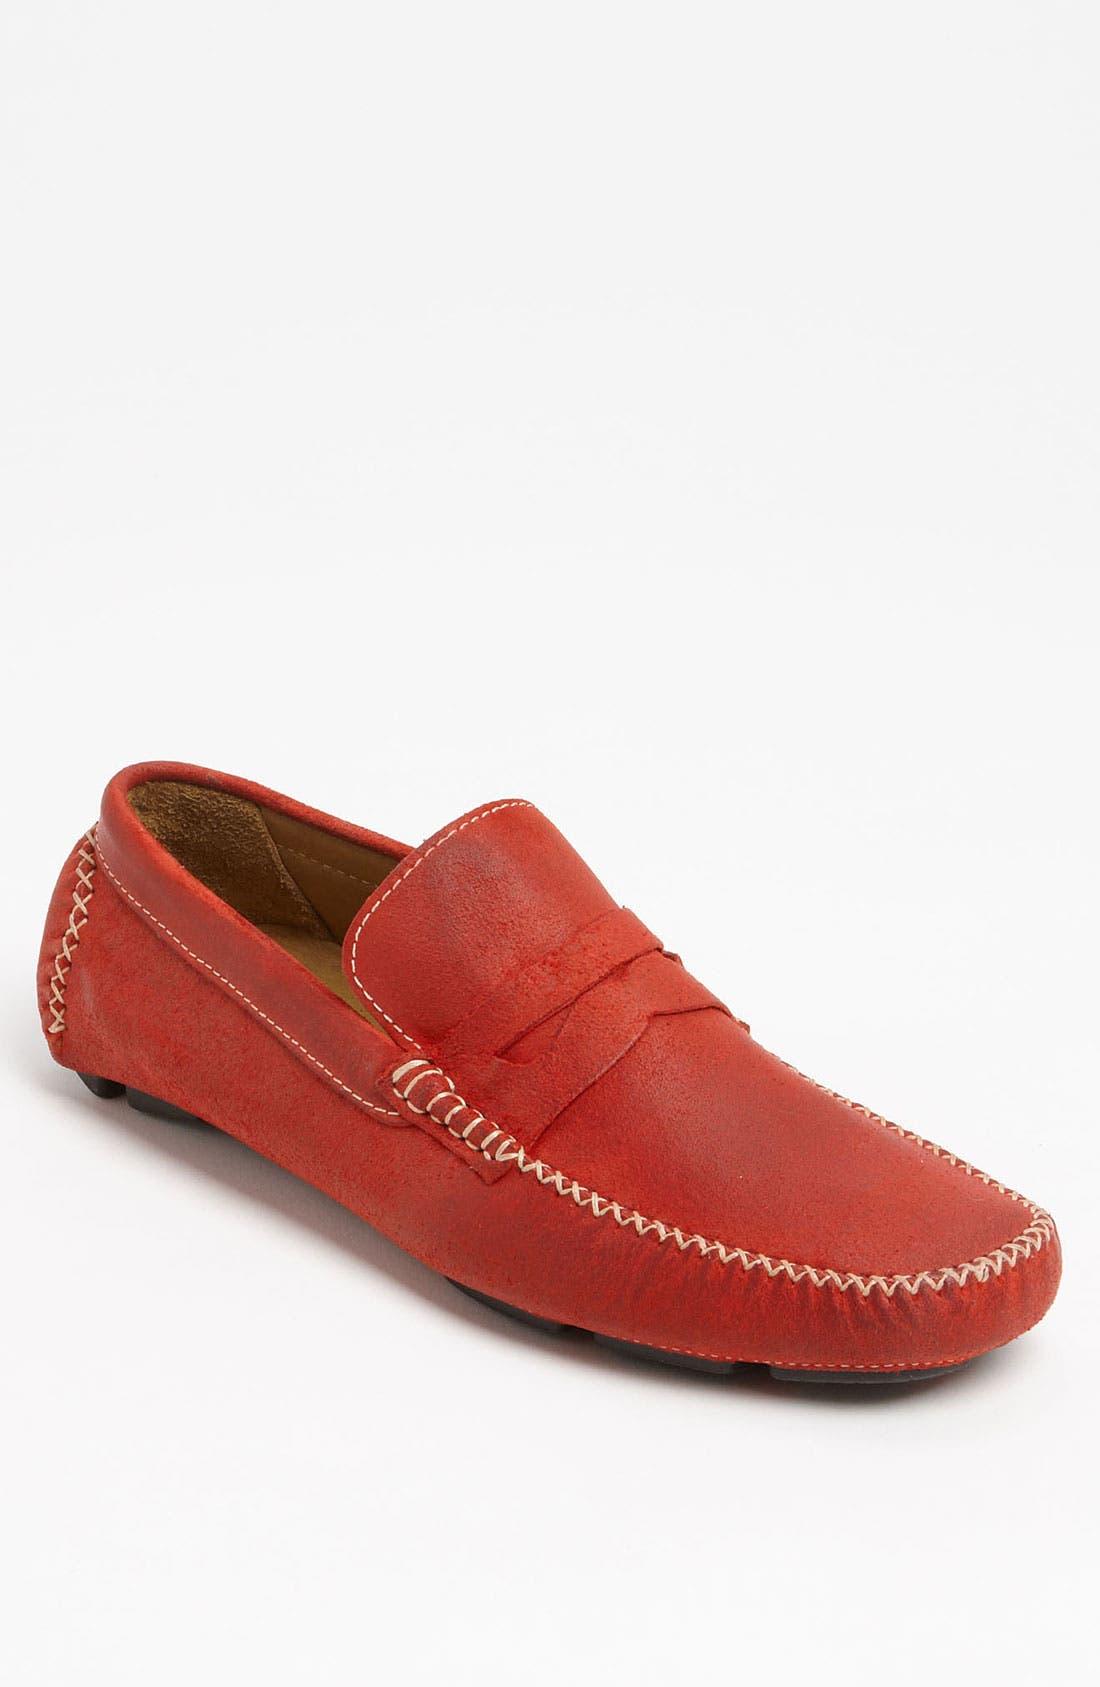 Alternate Image 1 Selected - Billy Reid Driving Shoe